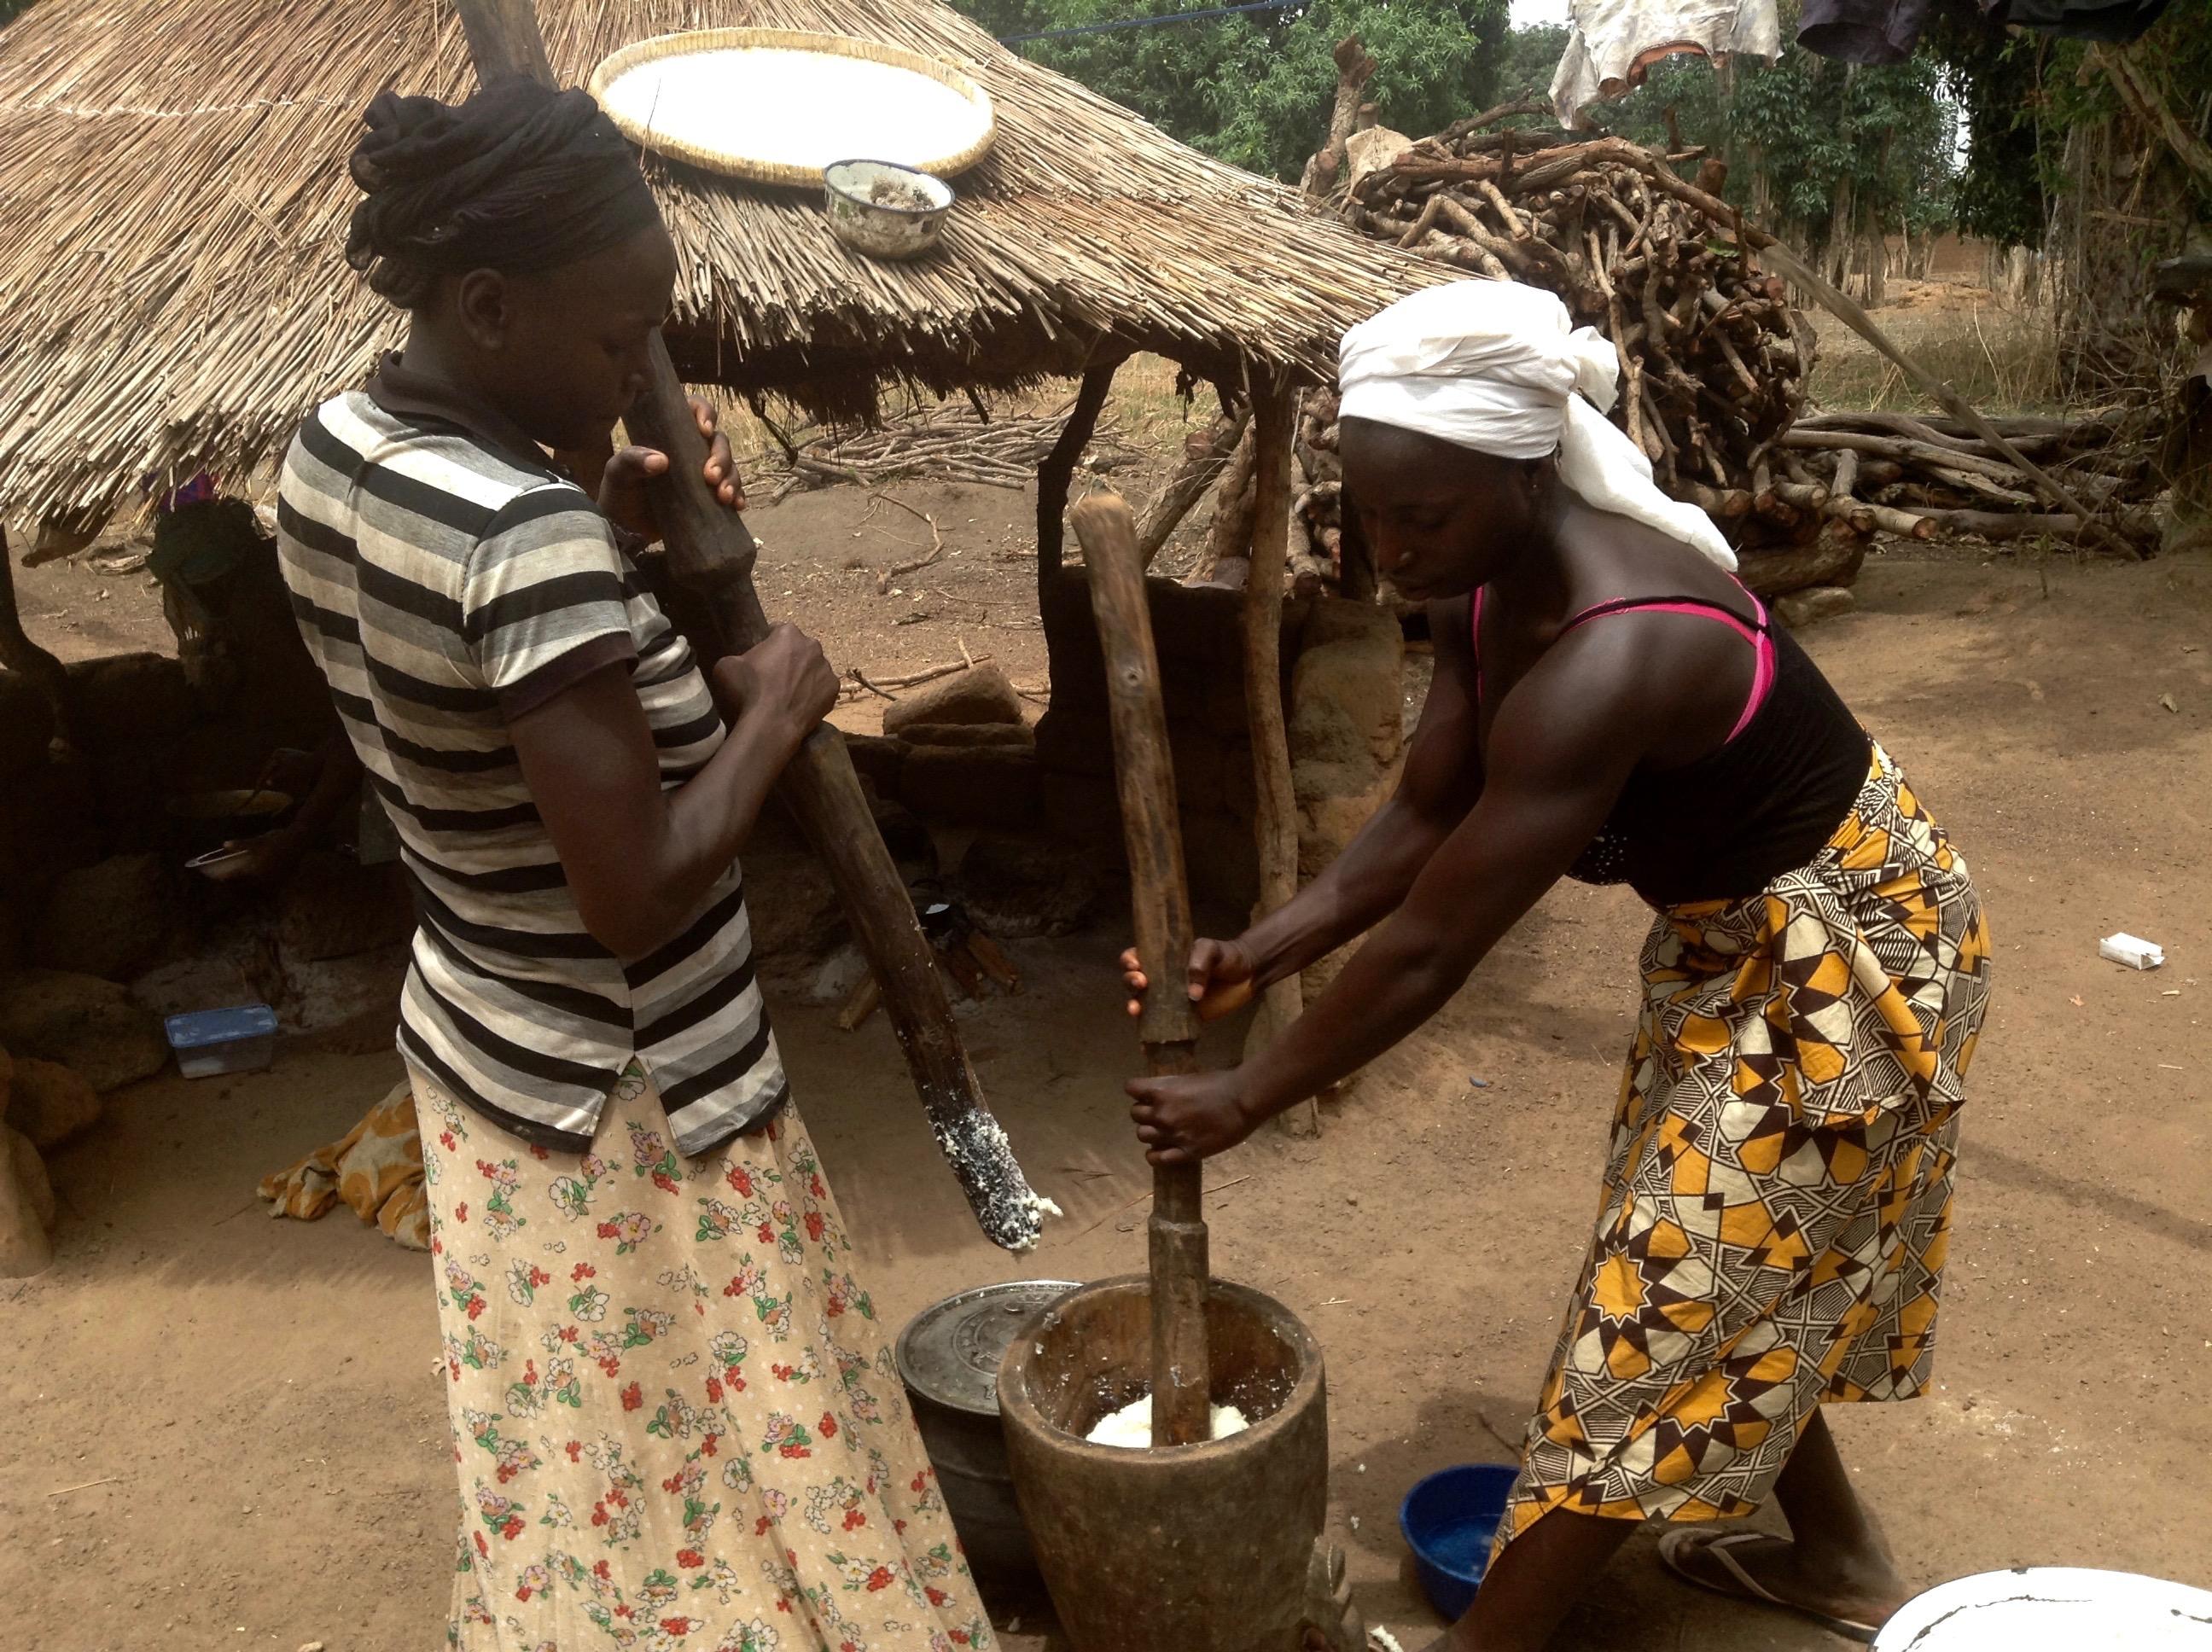 Women pounding yams in Fadan Kashe Village, Kaduna, Nigeria. #JujuFilms